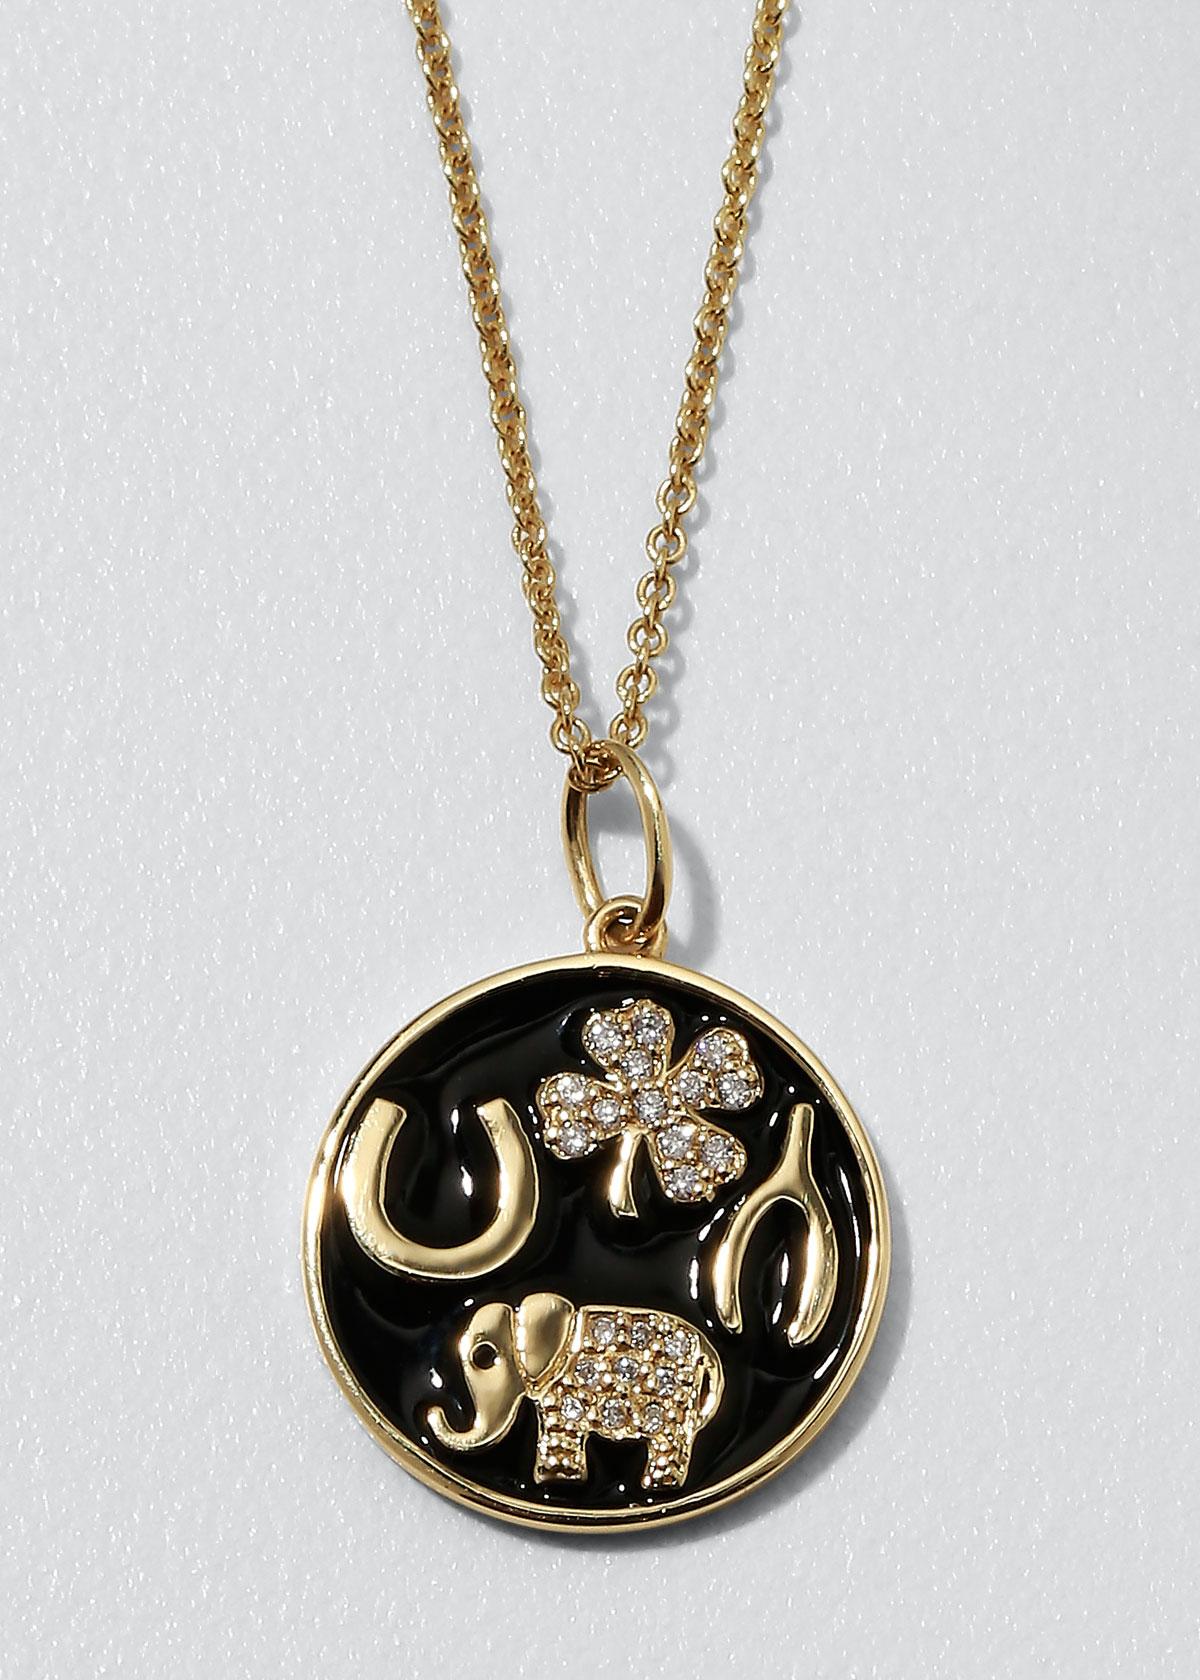 Sydney Evan Jewelries 14K LUCK TABLEAU DIAMOND MEDALLION NECKLACE, BLACK